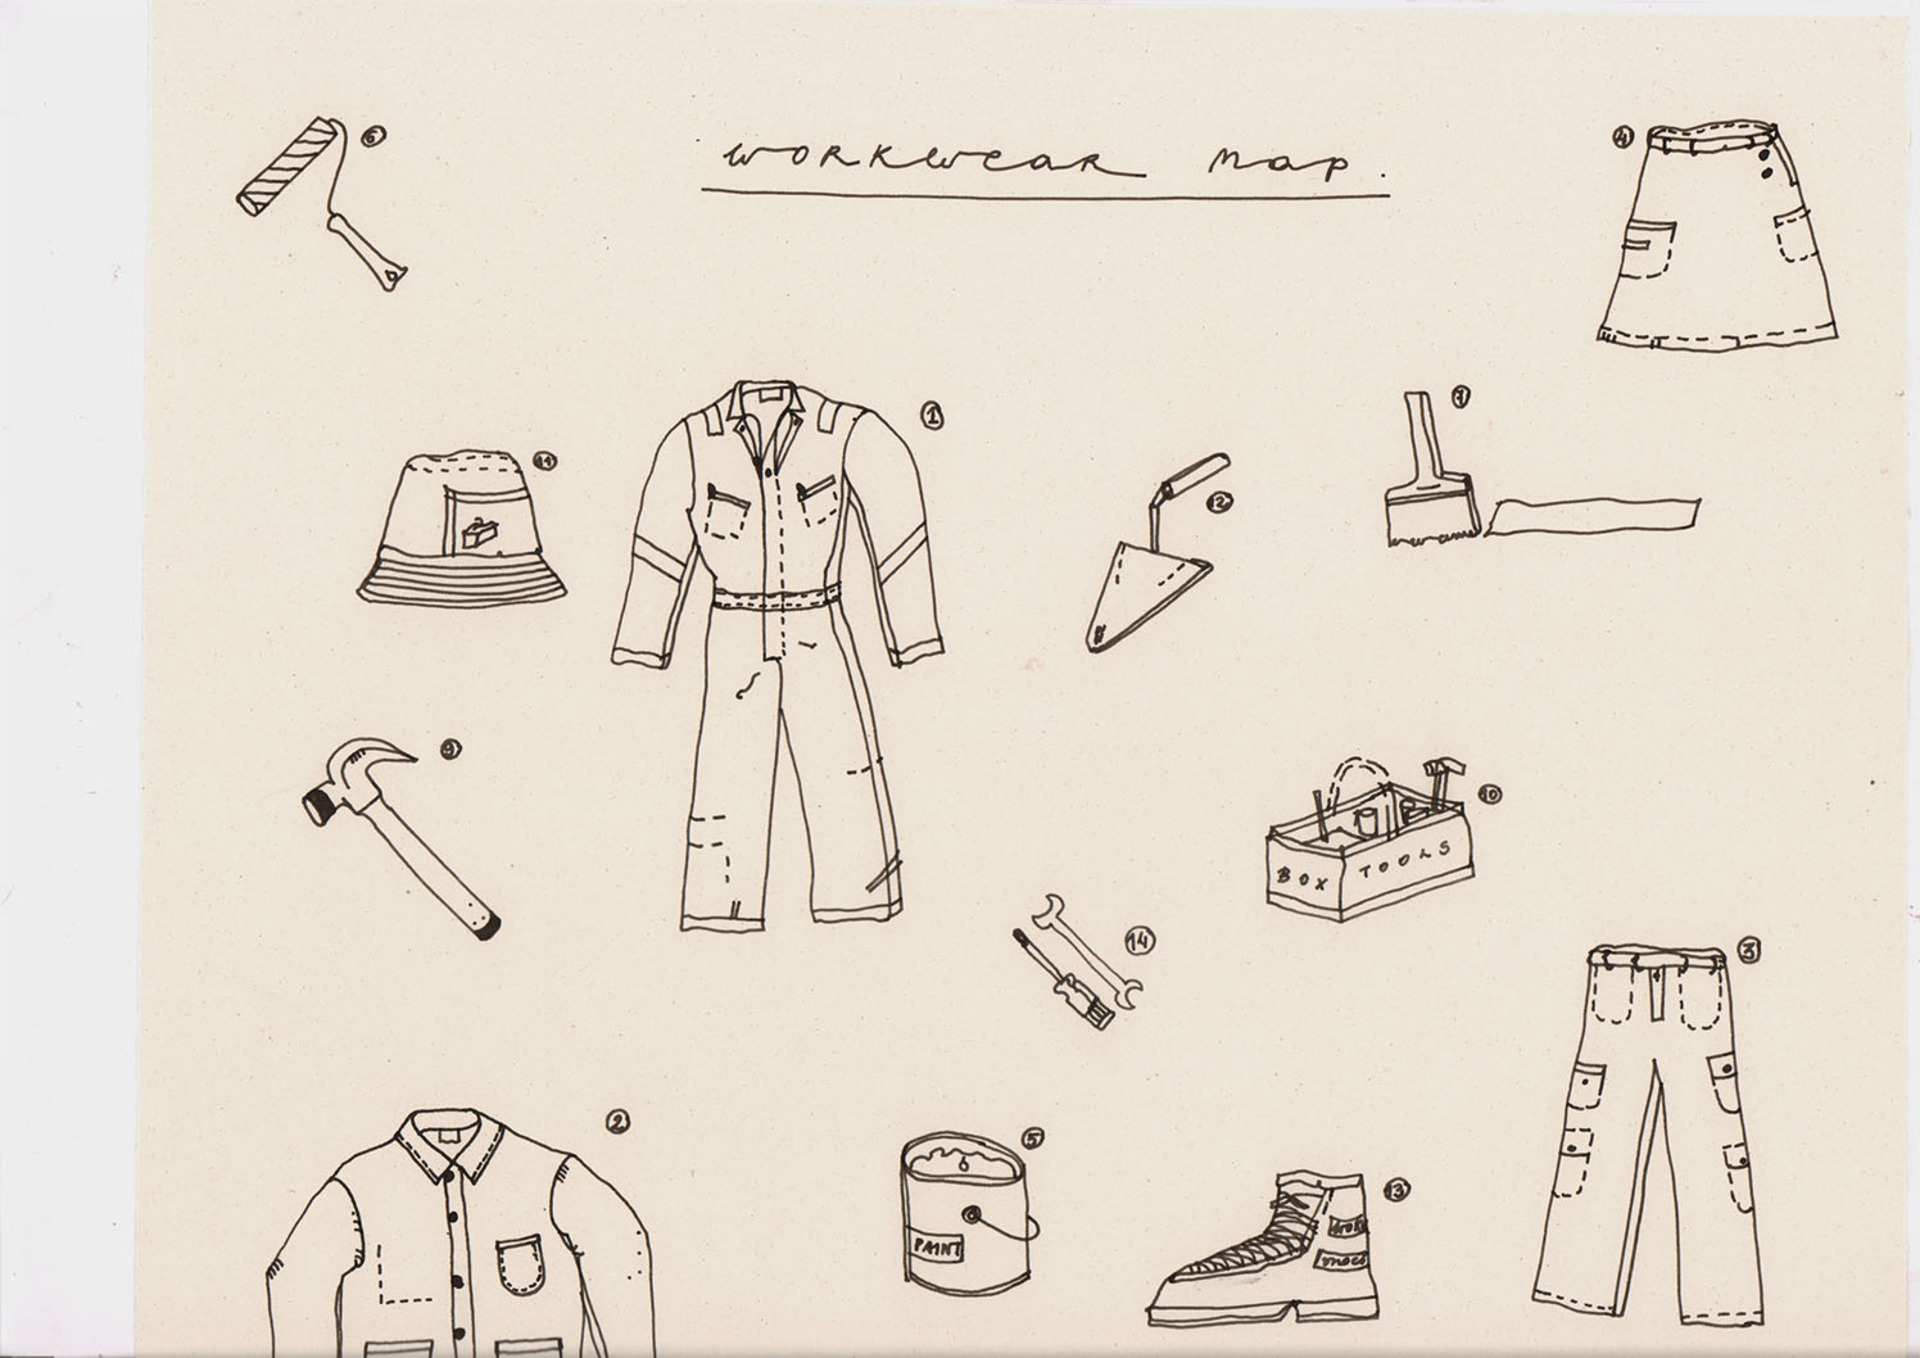 Workwear Map